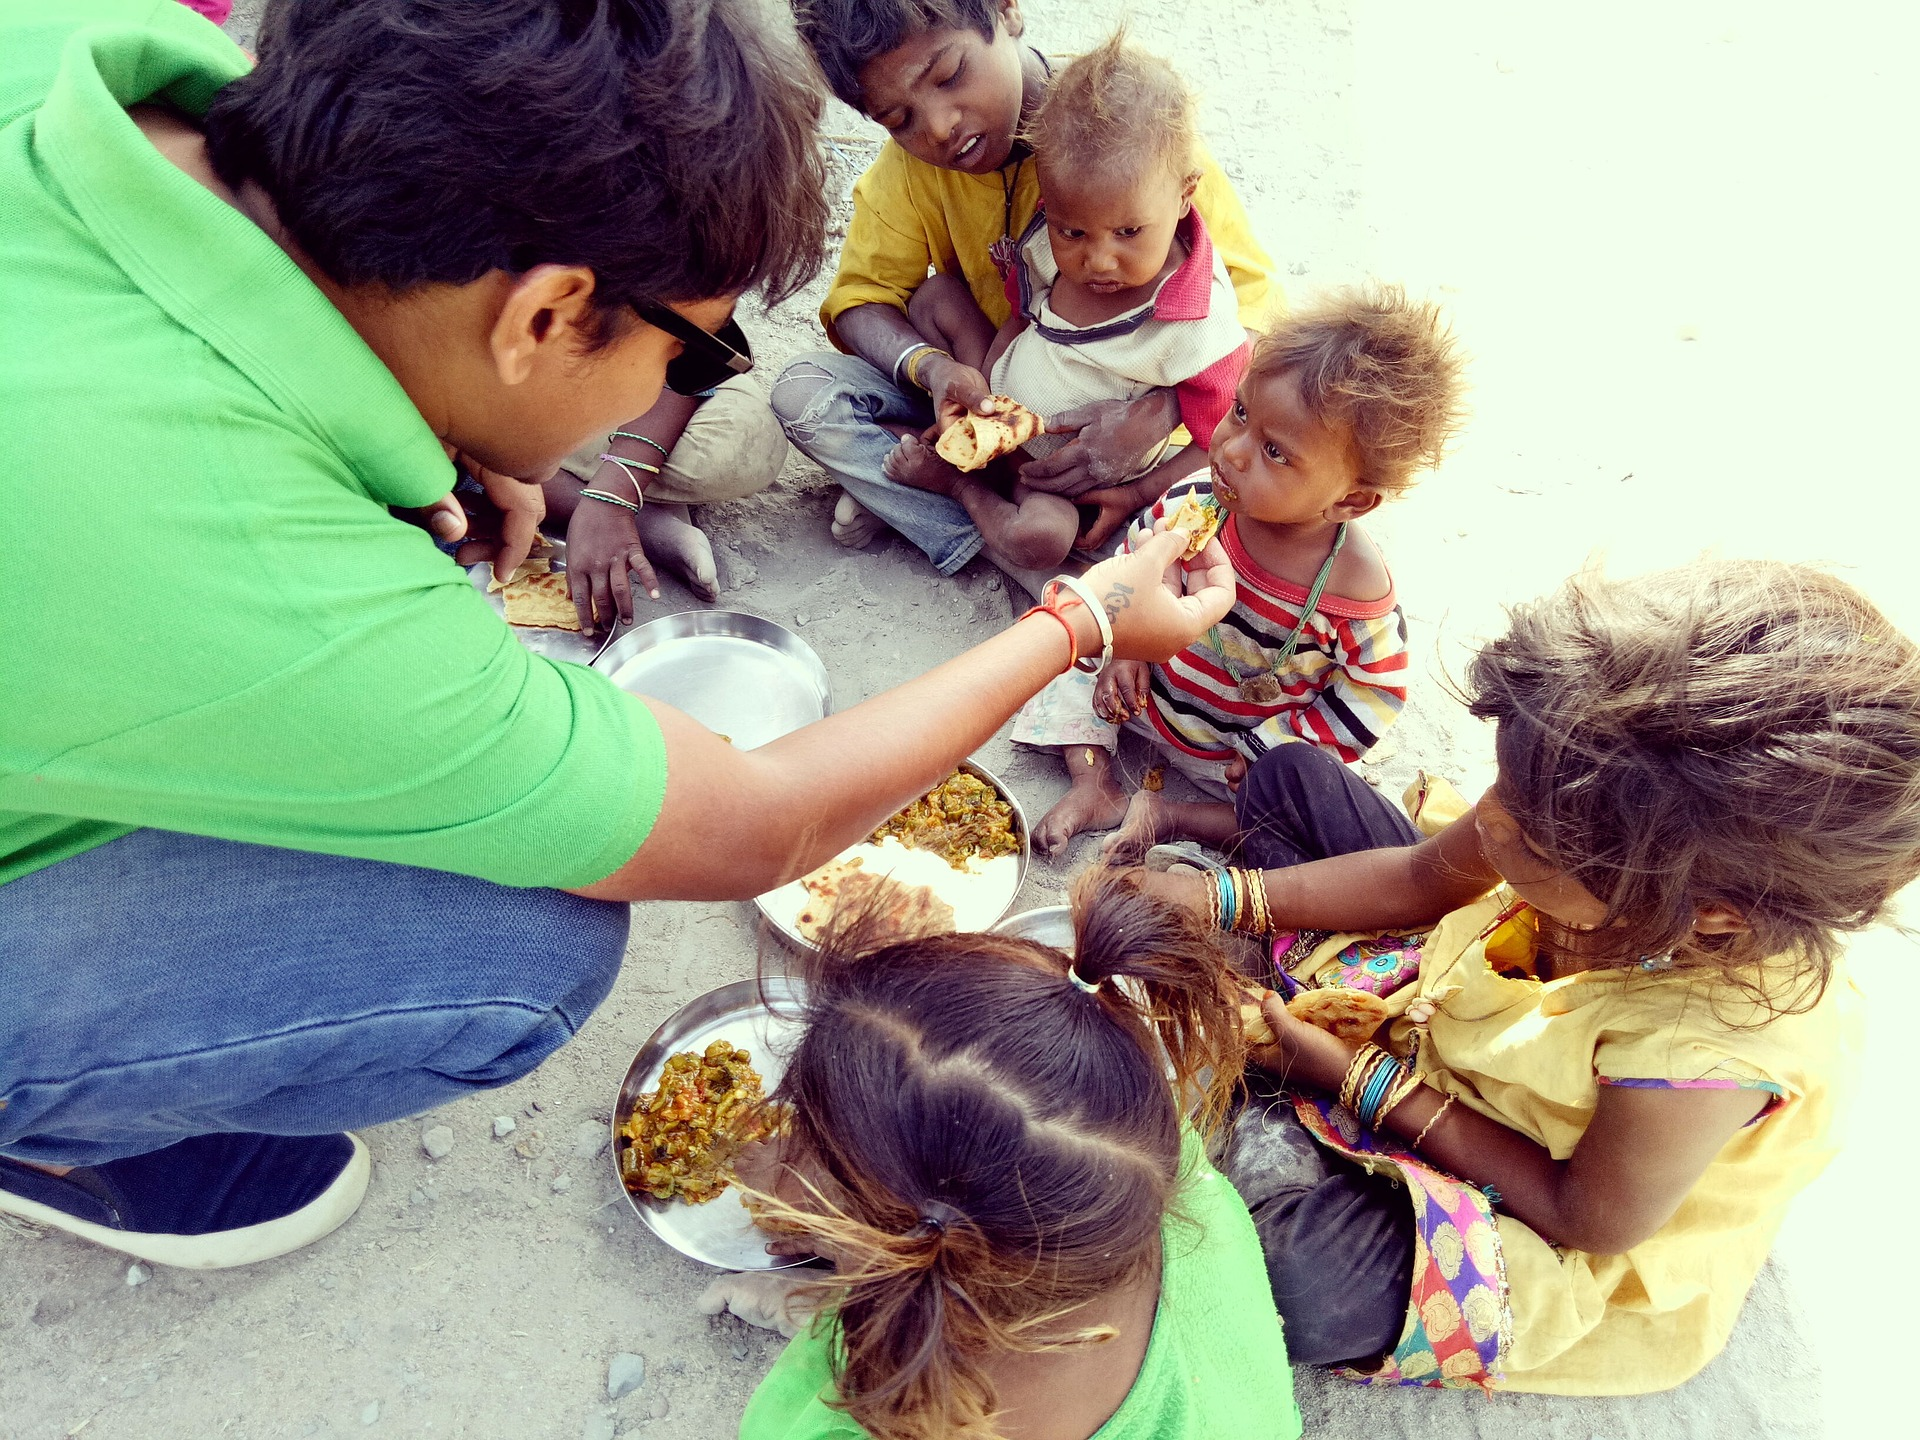 Luxju social impact